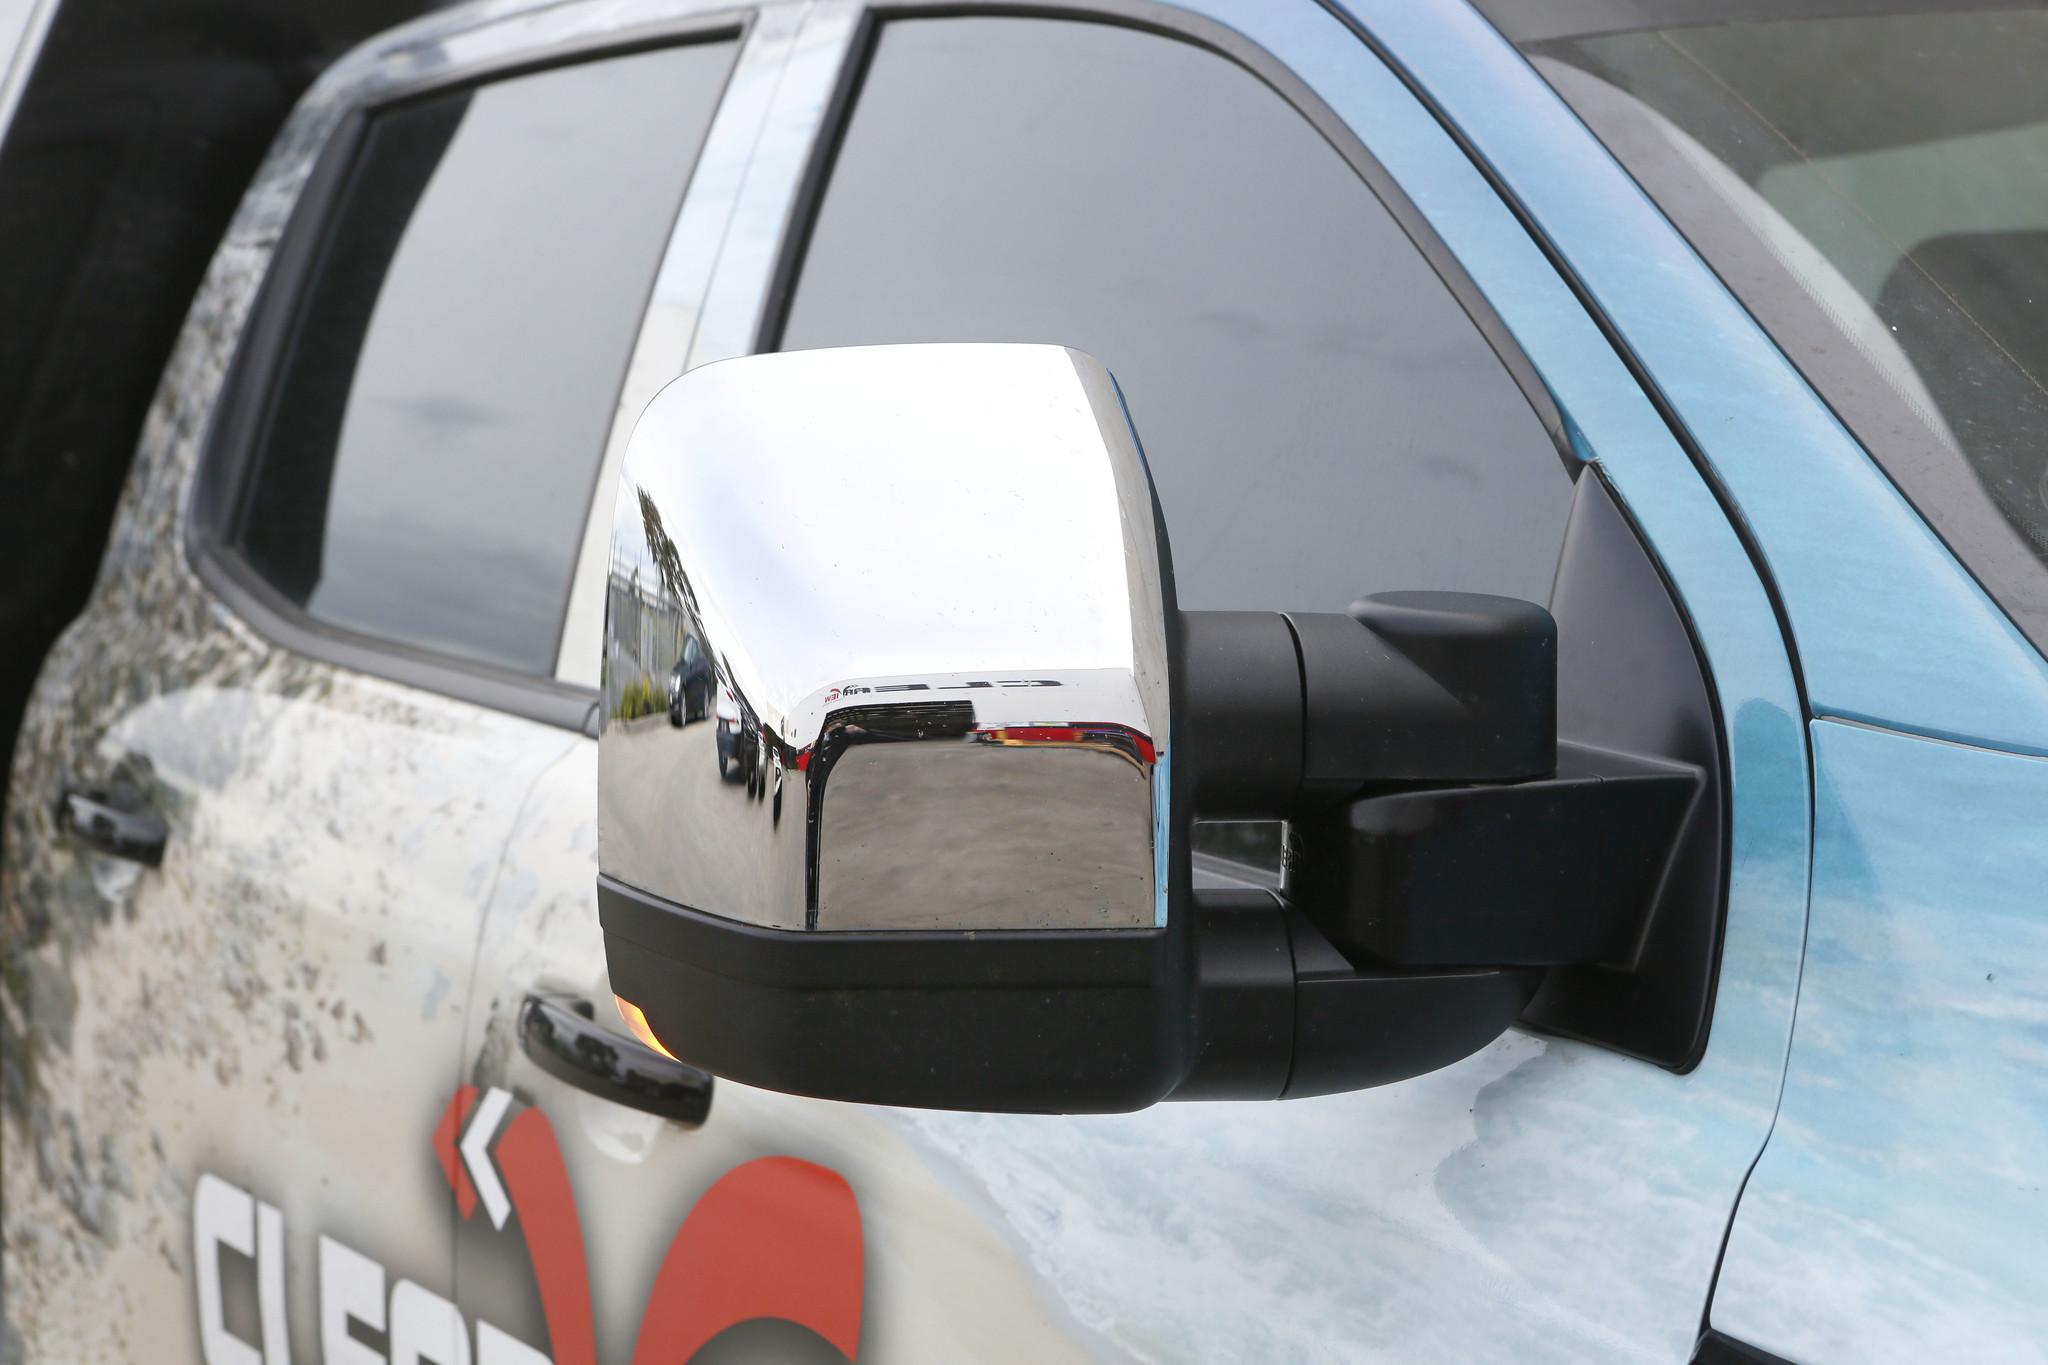 Mitsubishi NEXT GENERATION: Clearview Extra breite spiegel Mitsubishi L200 2015+